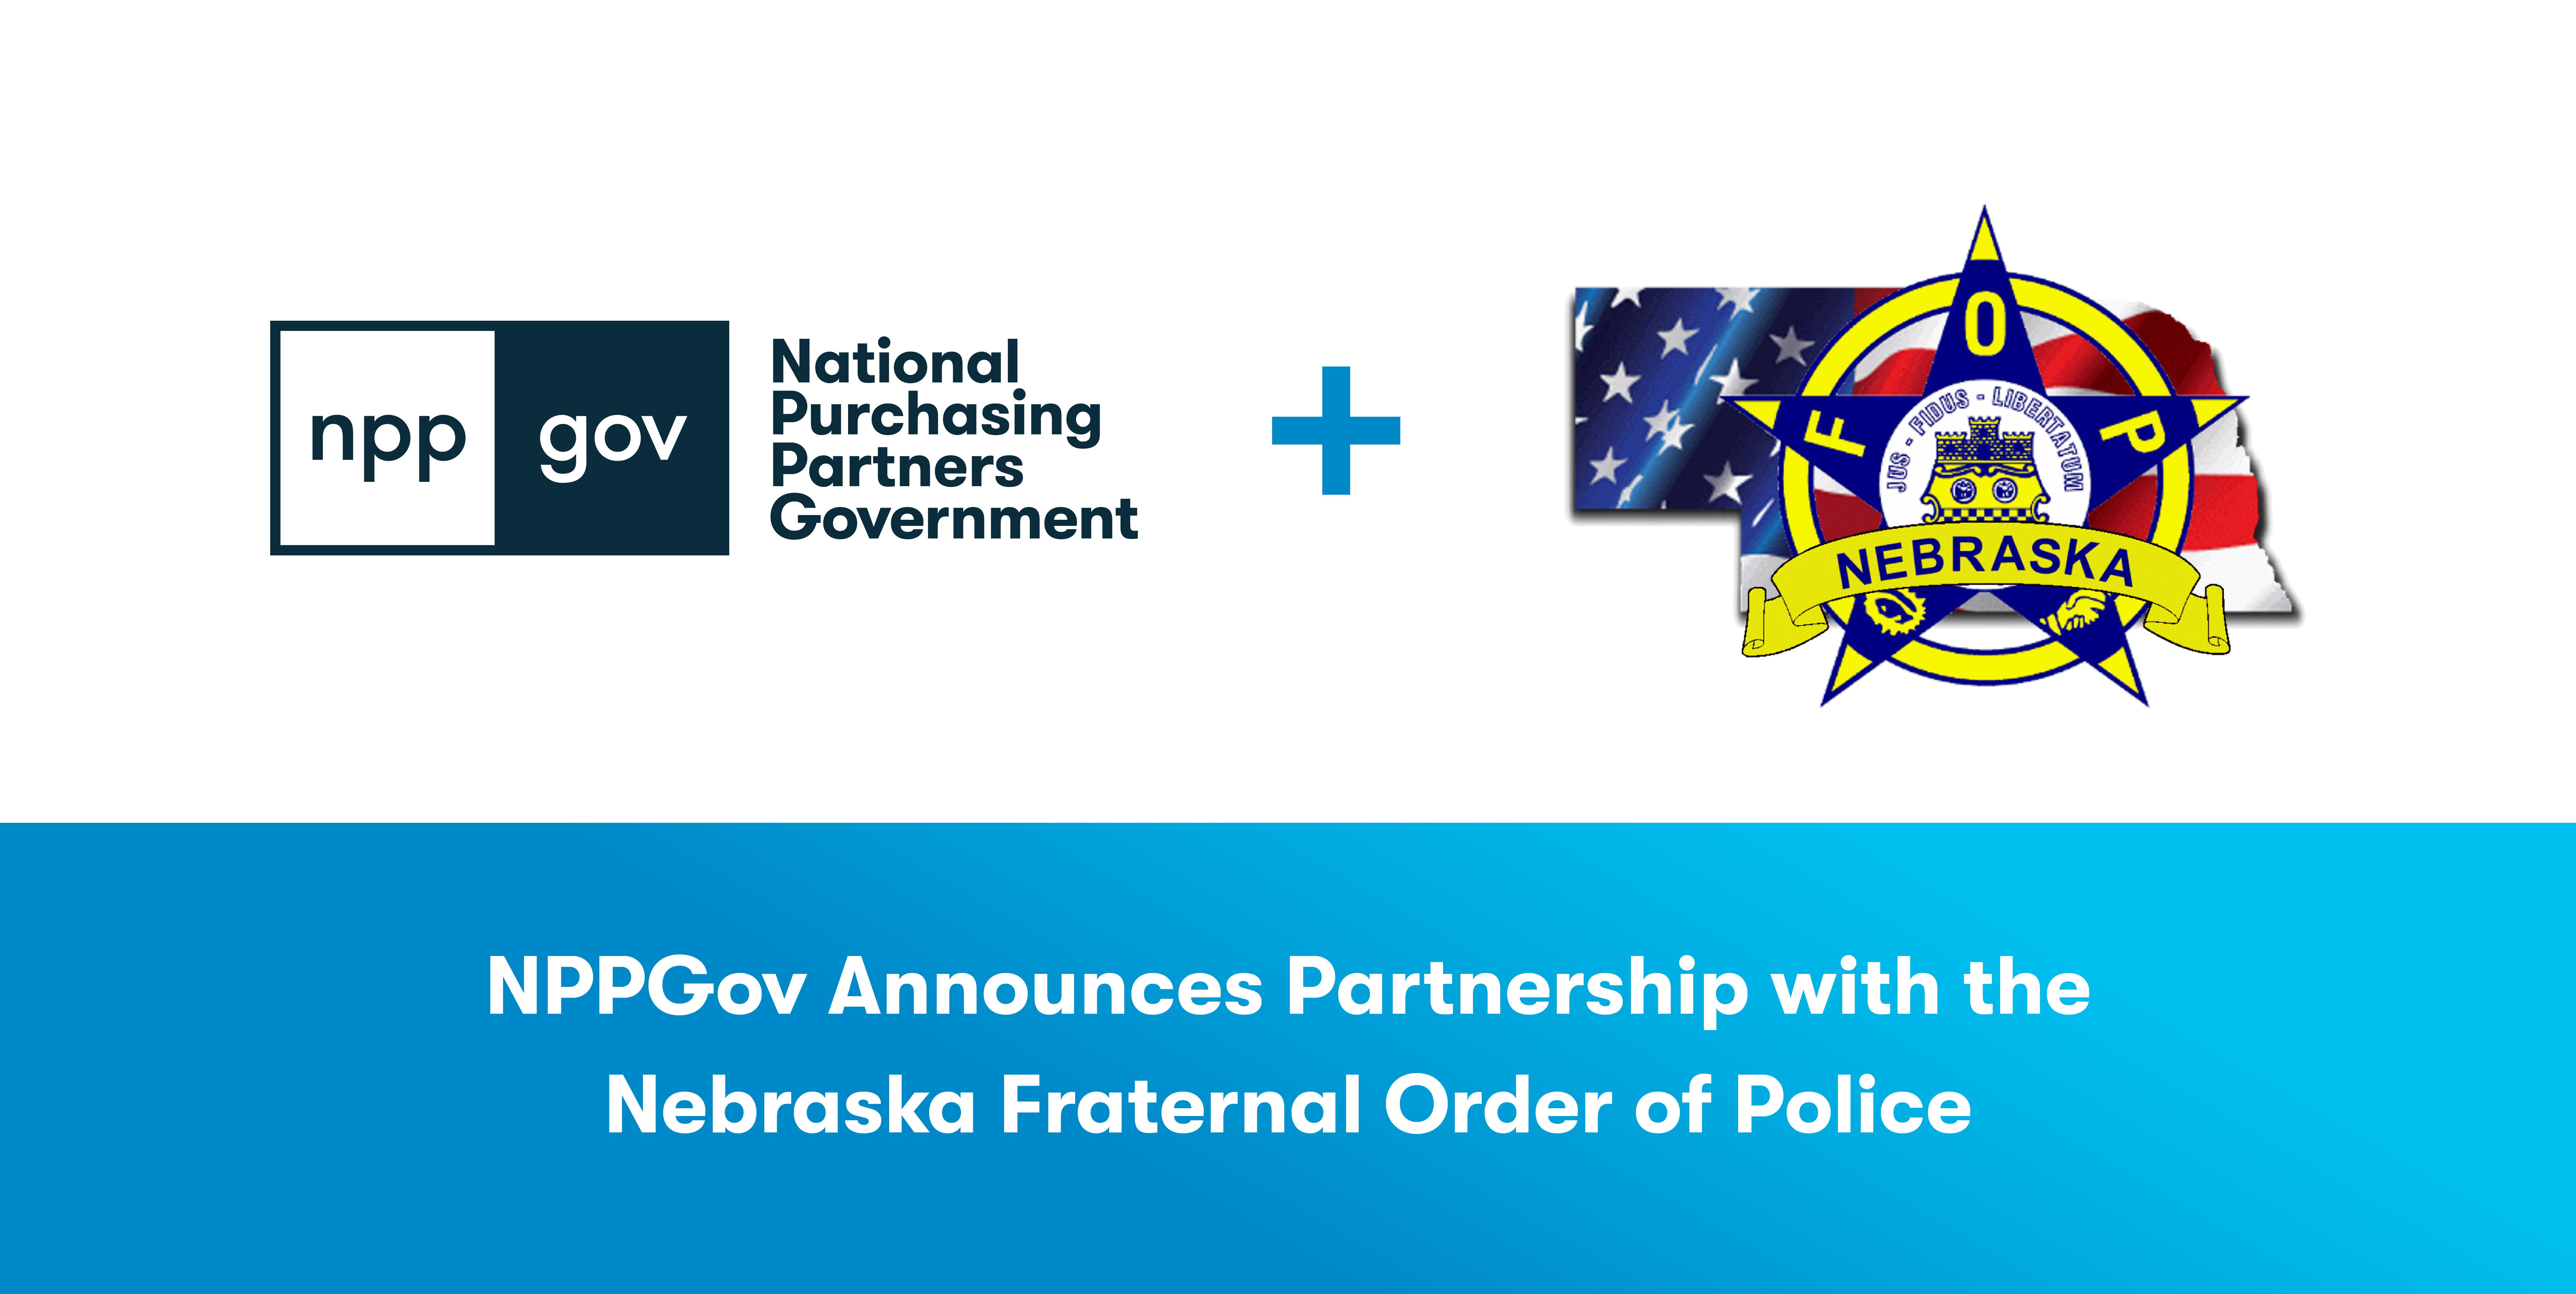 NPPGov Public Safety GPO Partners with the Nebraska Fraternal Order of Police